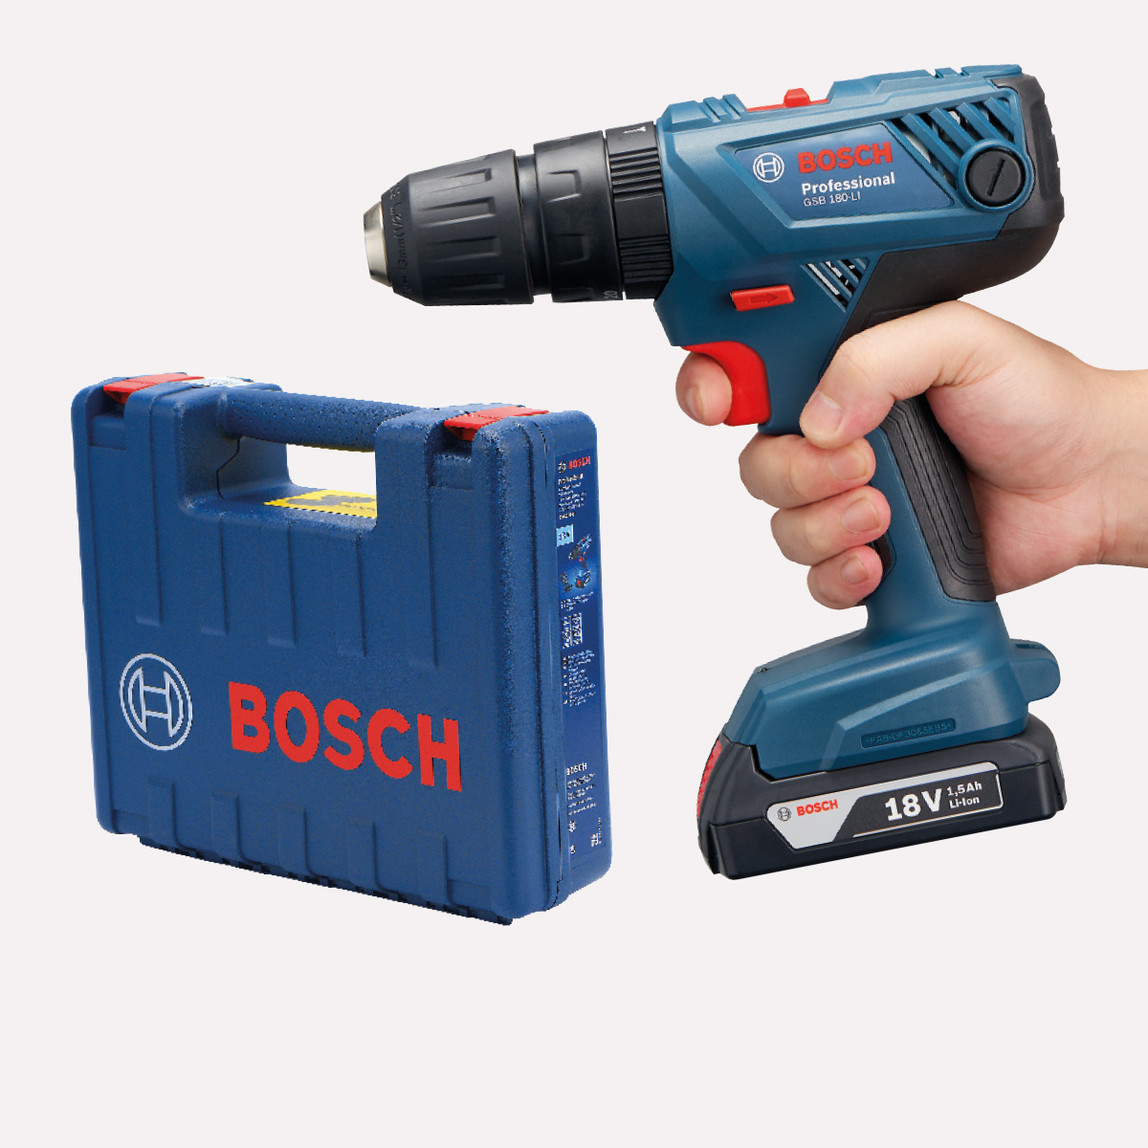 Bosch GSB 180-LI 18V 1,5 Ah Çift Akülü Profesyonel Darbeli Vidalama